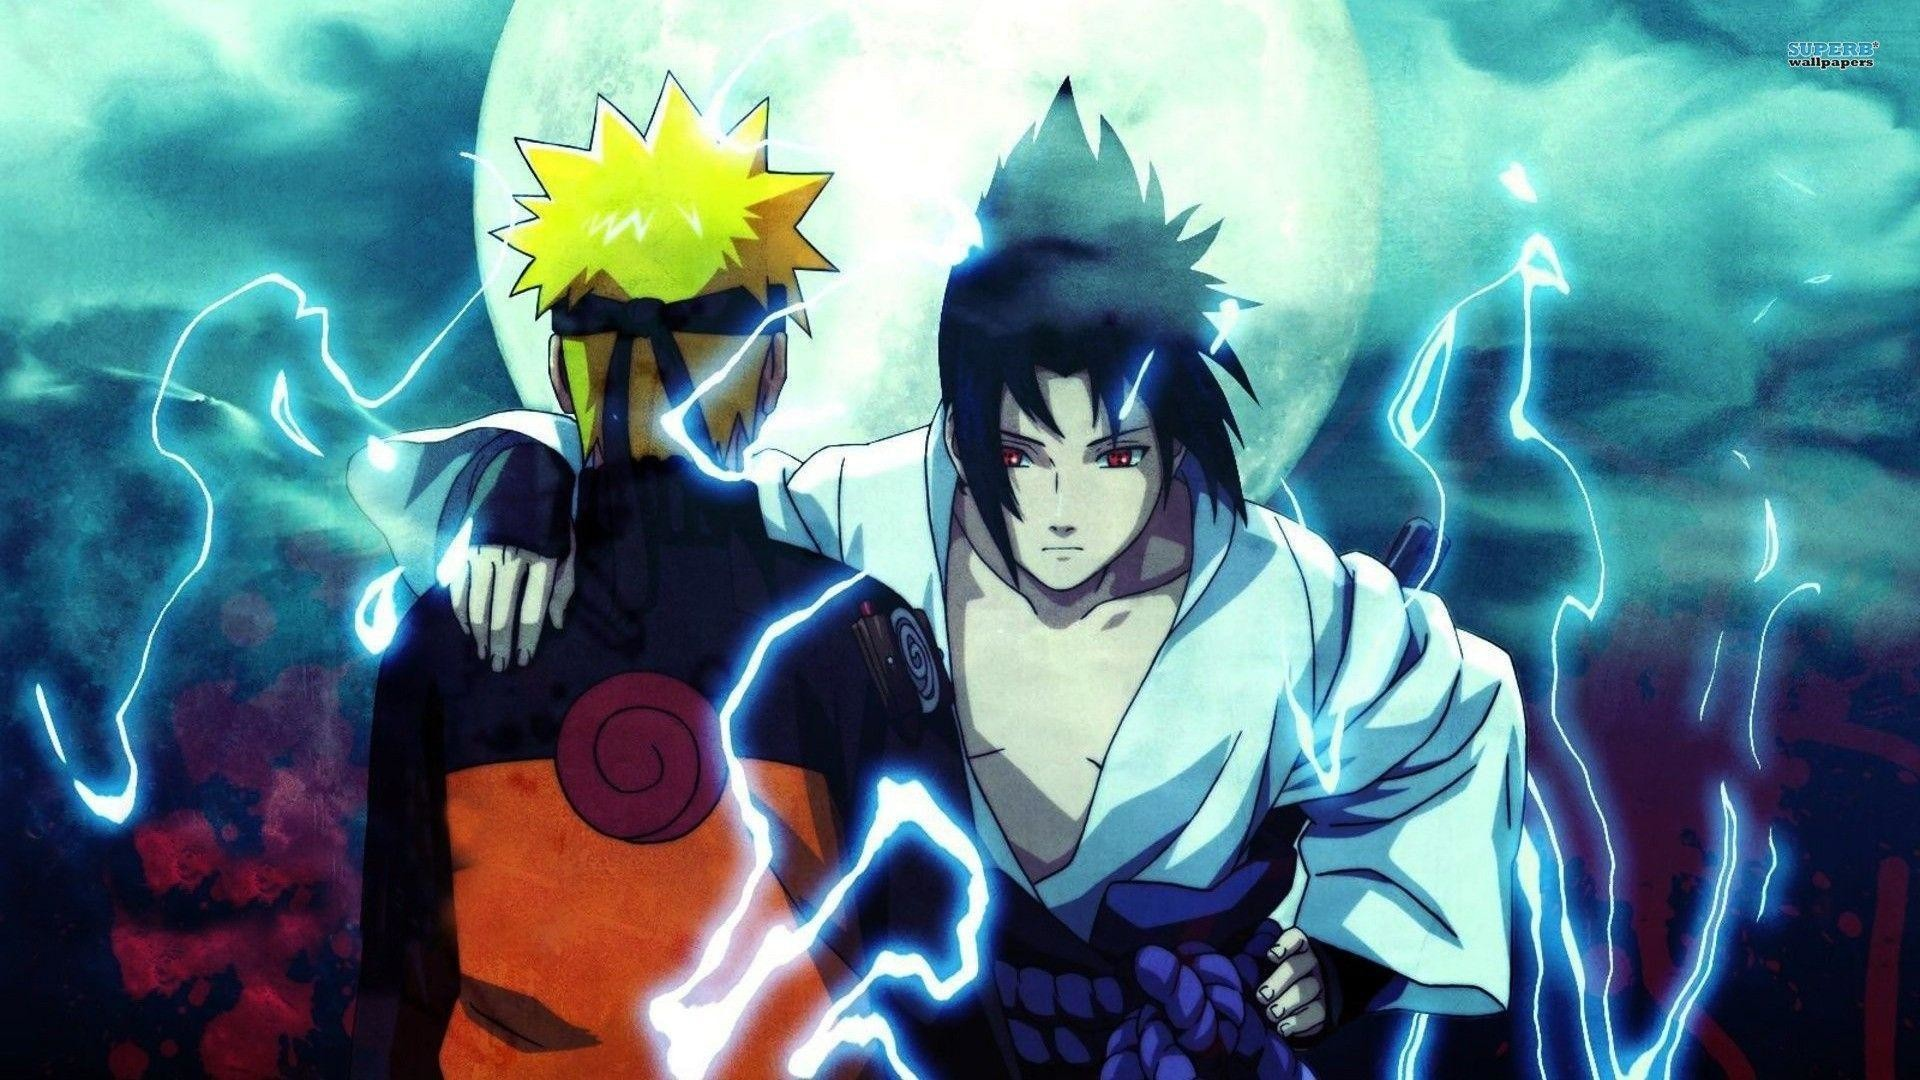 42 Jiraiya (Naruto) HD Wallpapers | Backgrounds – Wallpaper Abyss